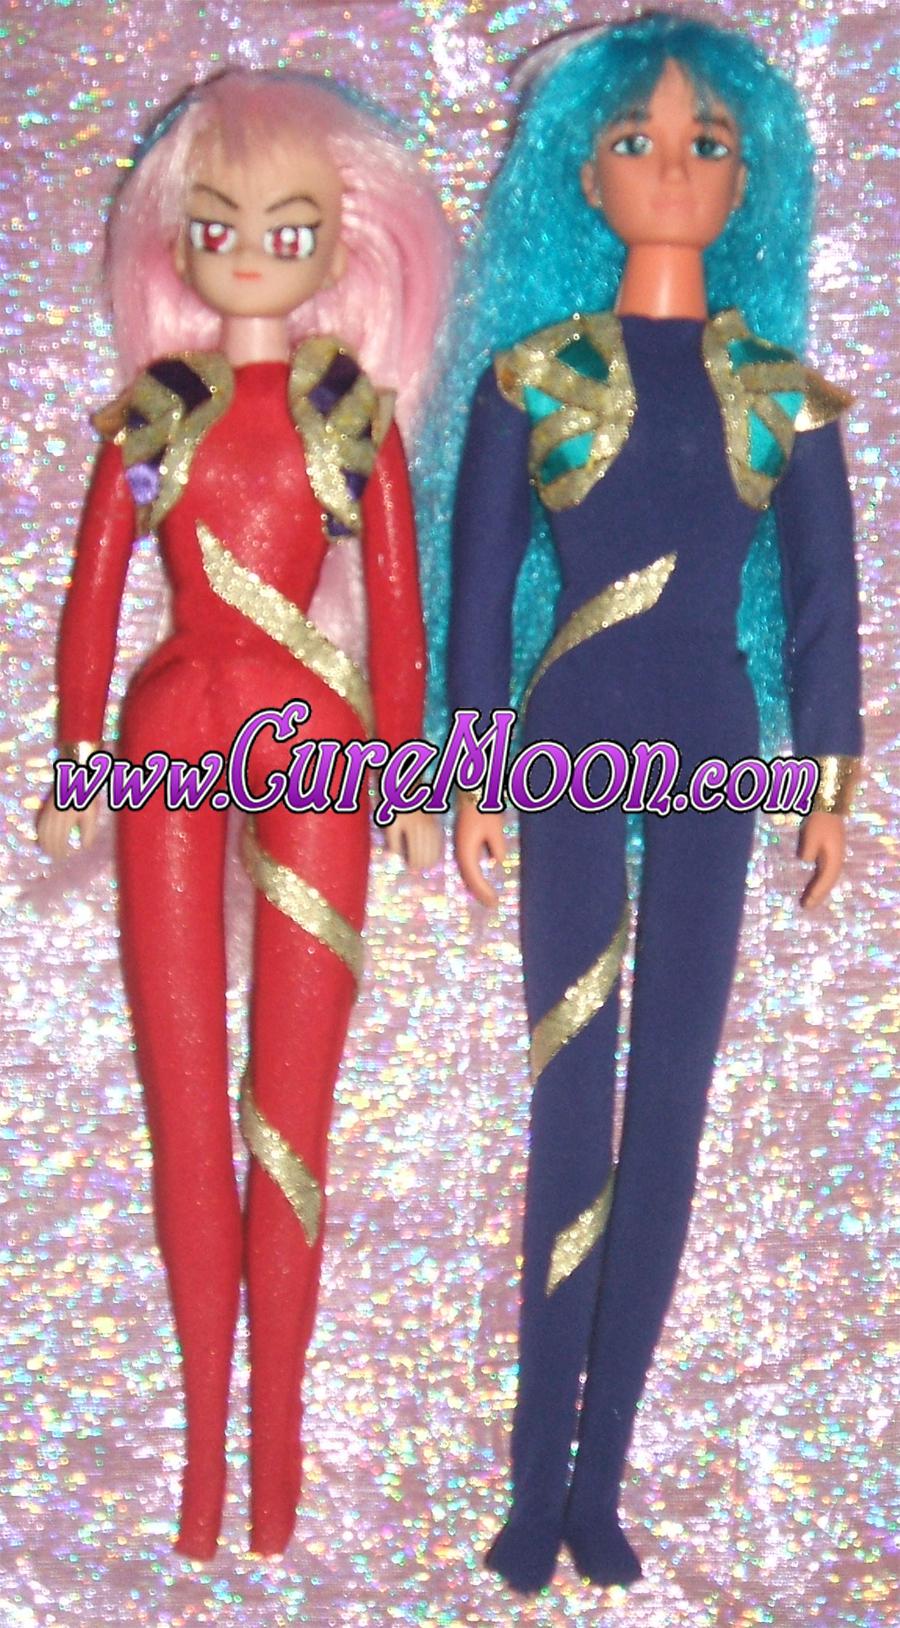 ale-anna-ail-ann-sailor-moon-r-custom-ooak-handmade-alien-bunnytsukino-curemoon